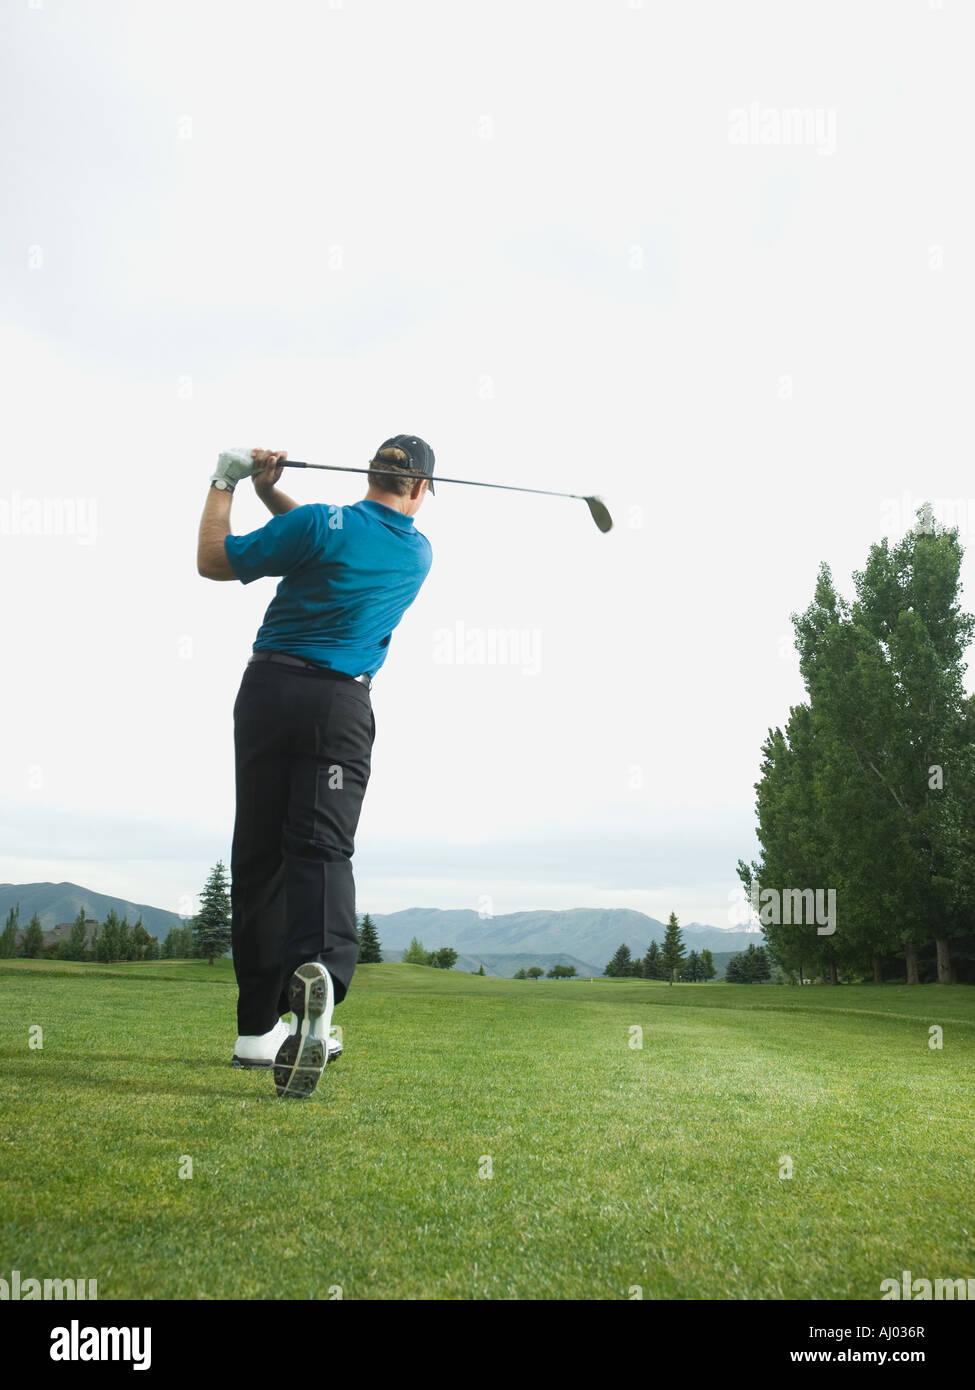 Man swinging golf club - Stock Image